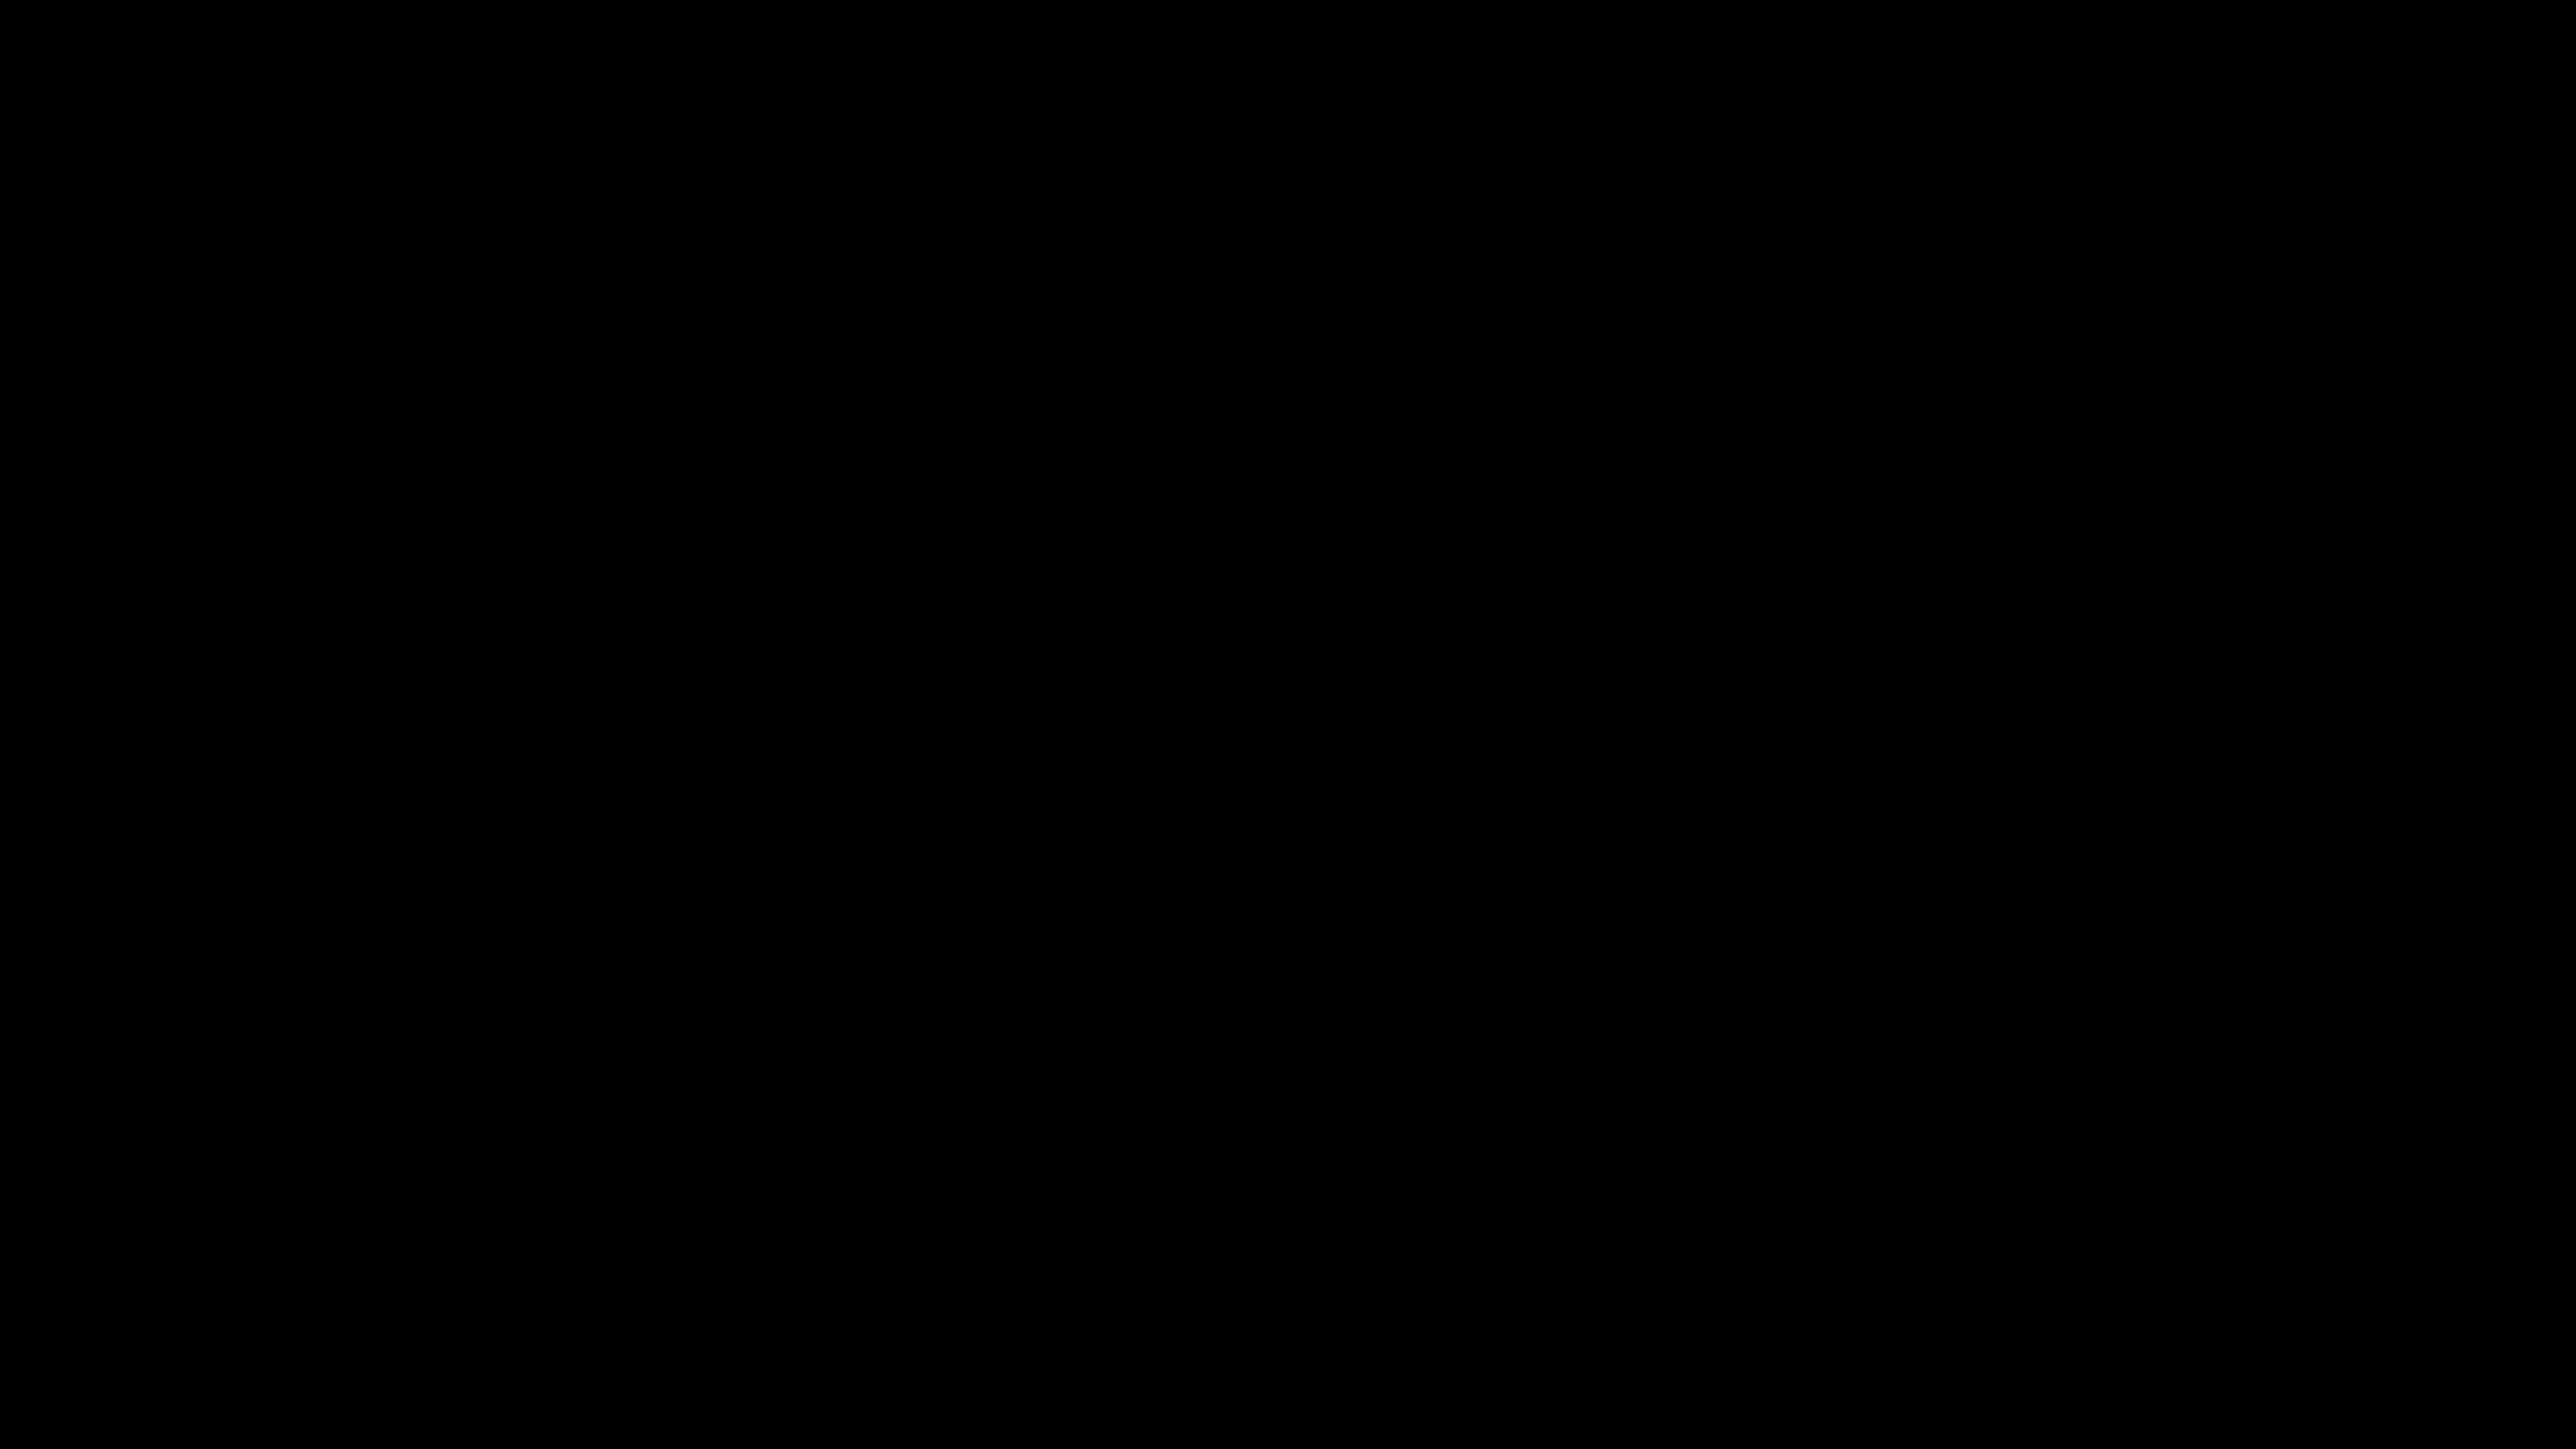 3840x2160 Black Solid Color Background